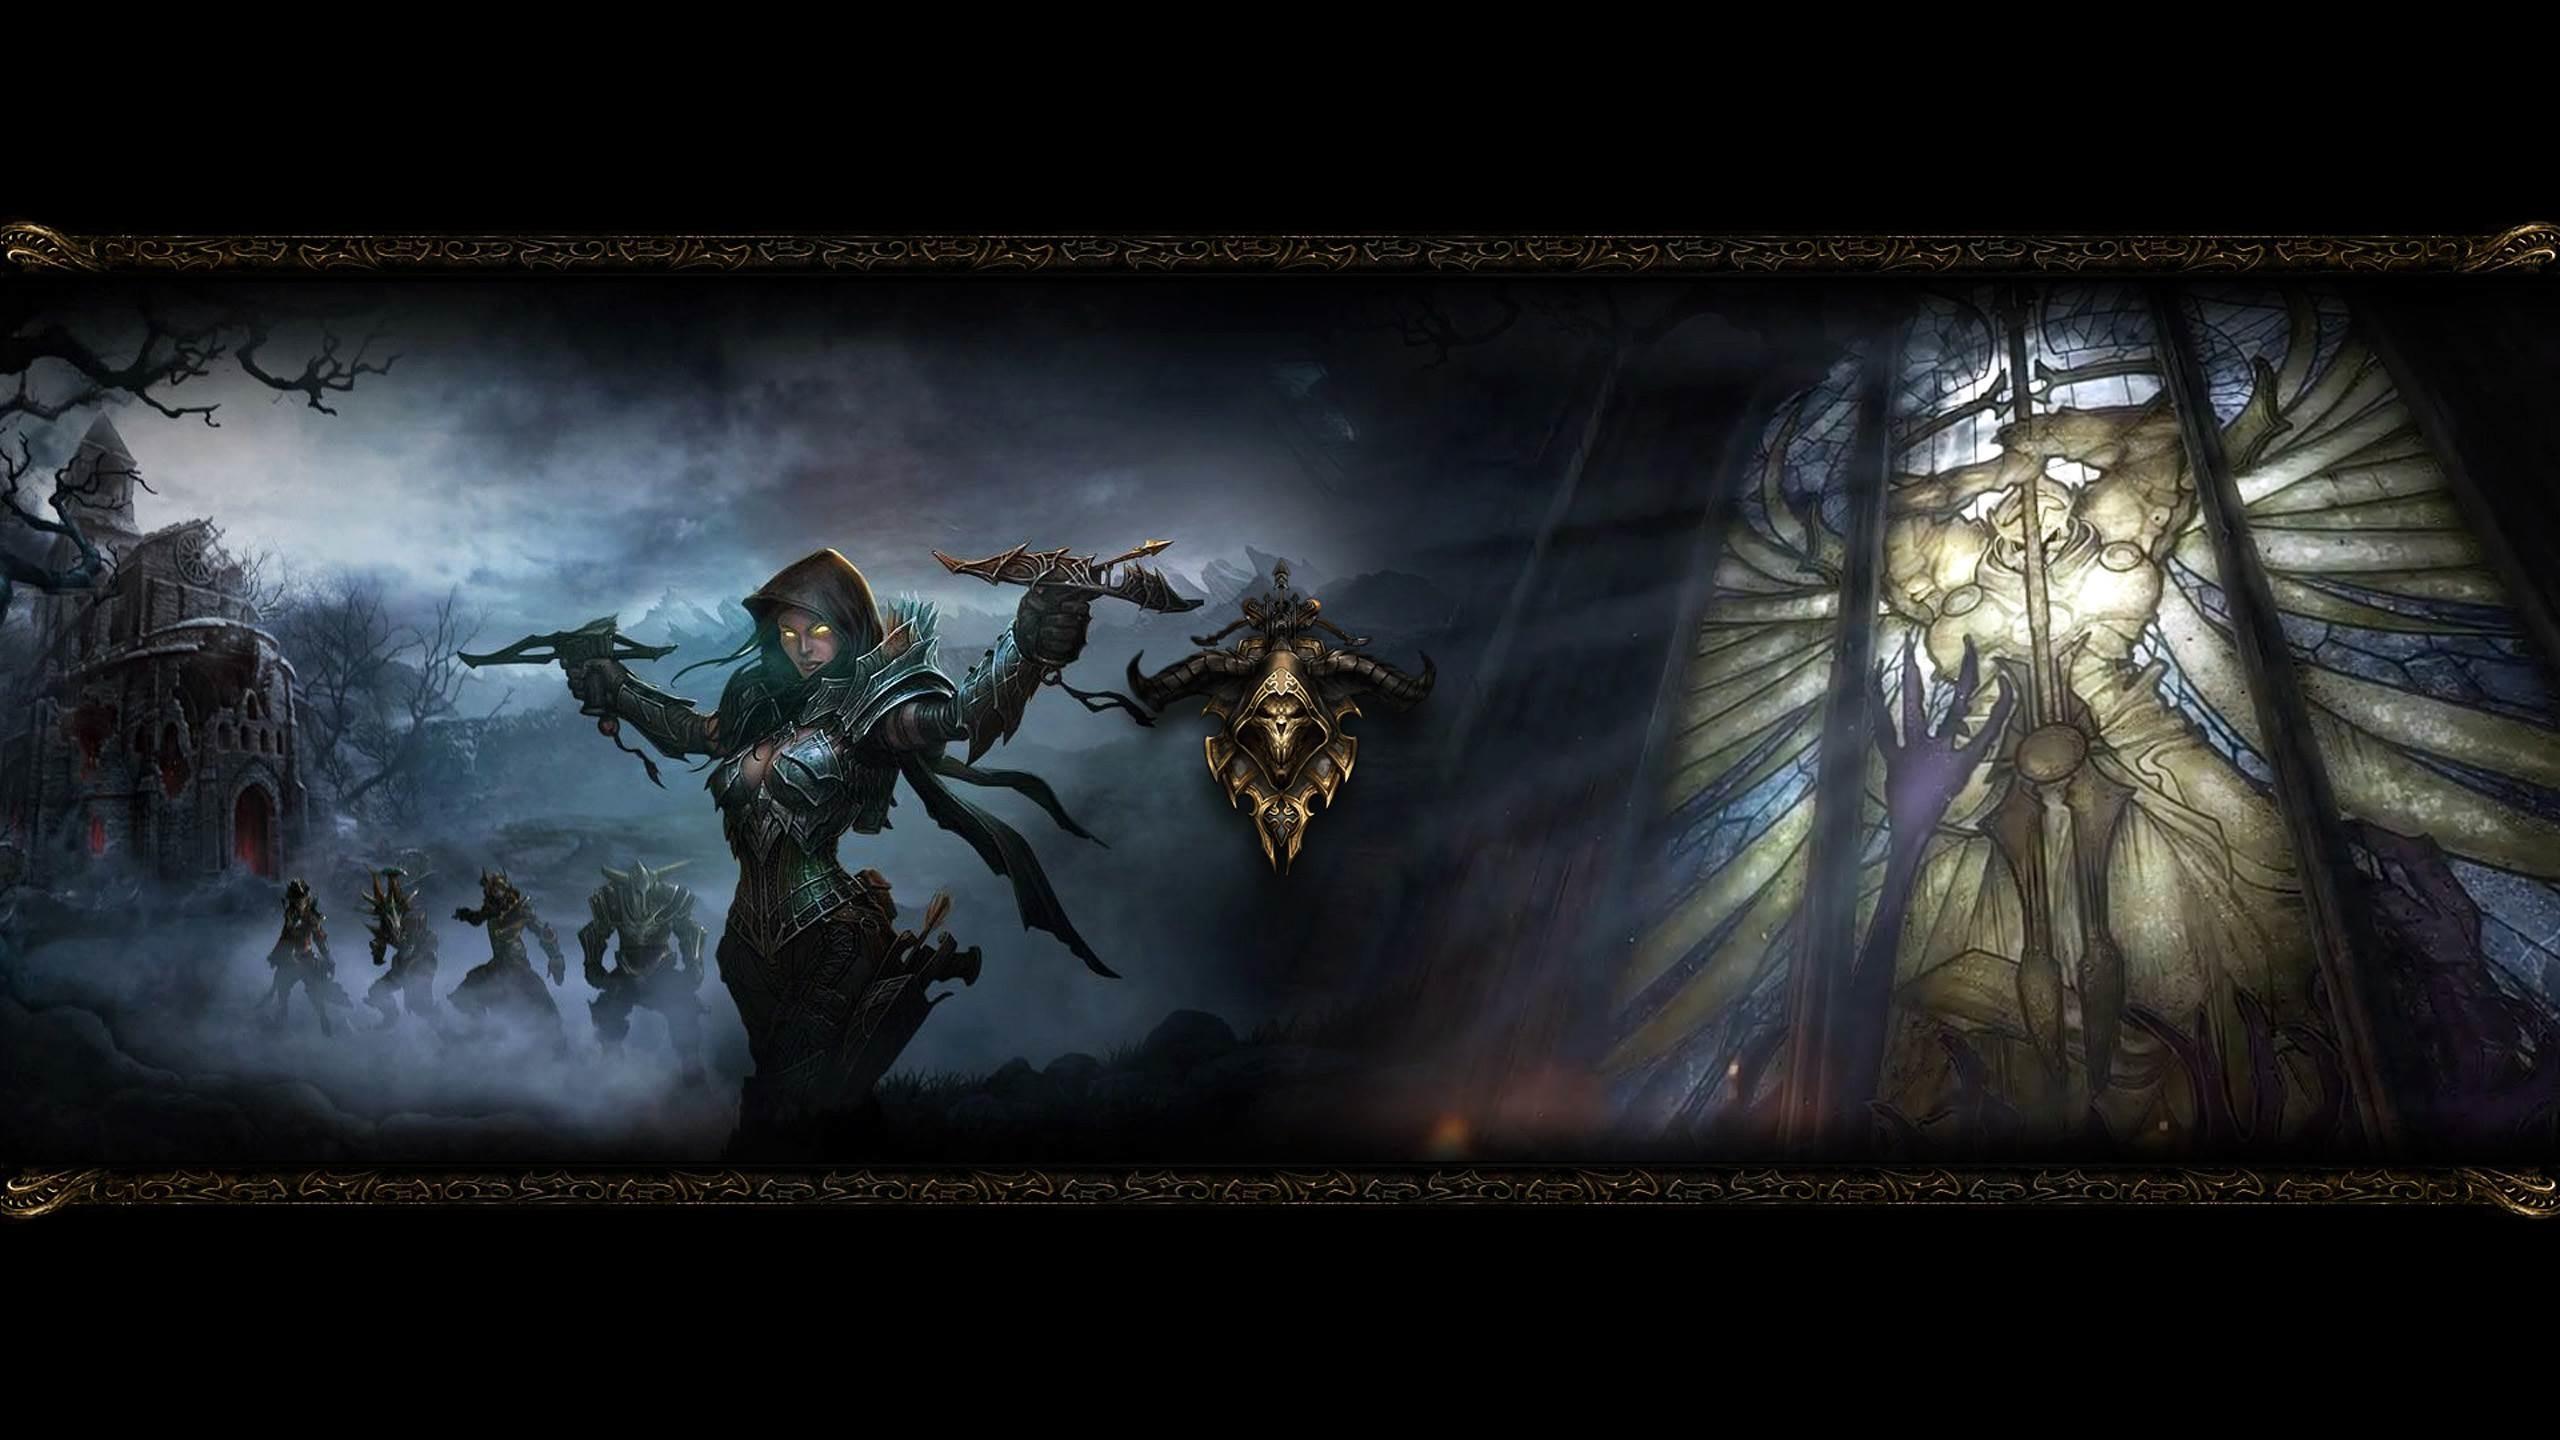 Demon Hunter Diablo Wallpaper HD For Desktop and Mobile 1920×1080 Demon  Hunter Wallpapers  